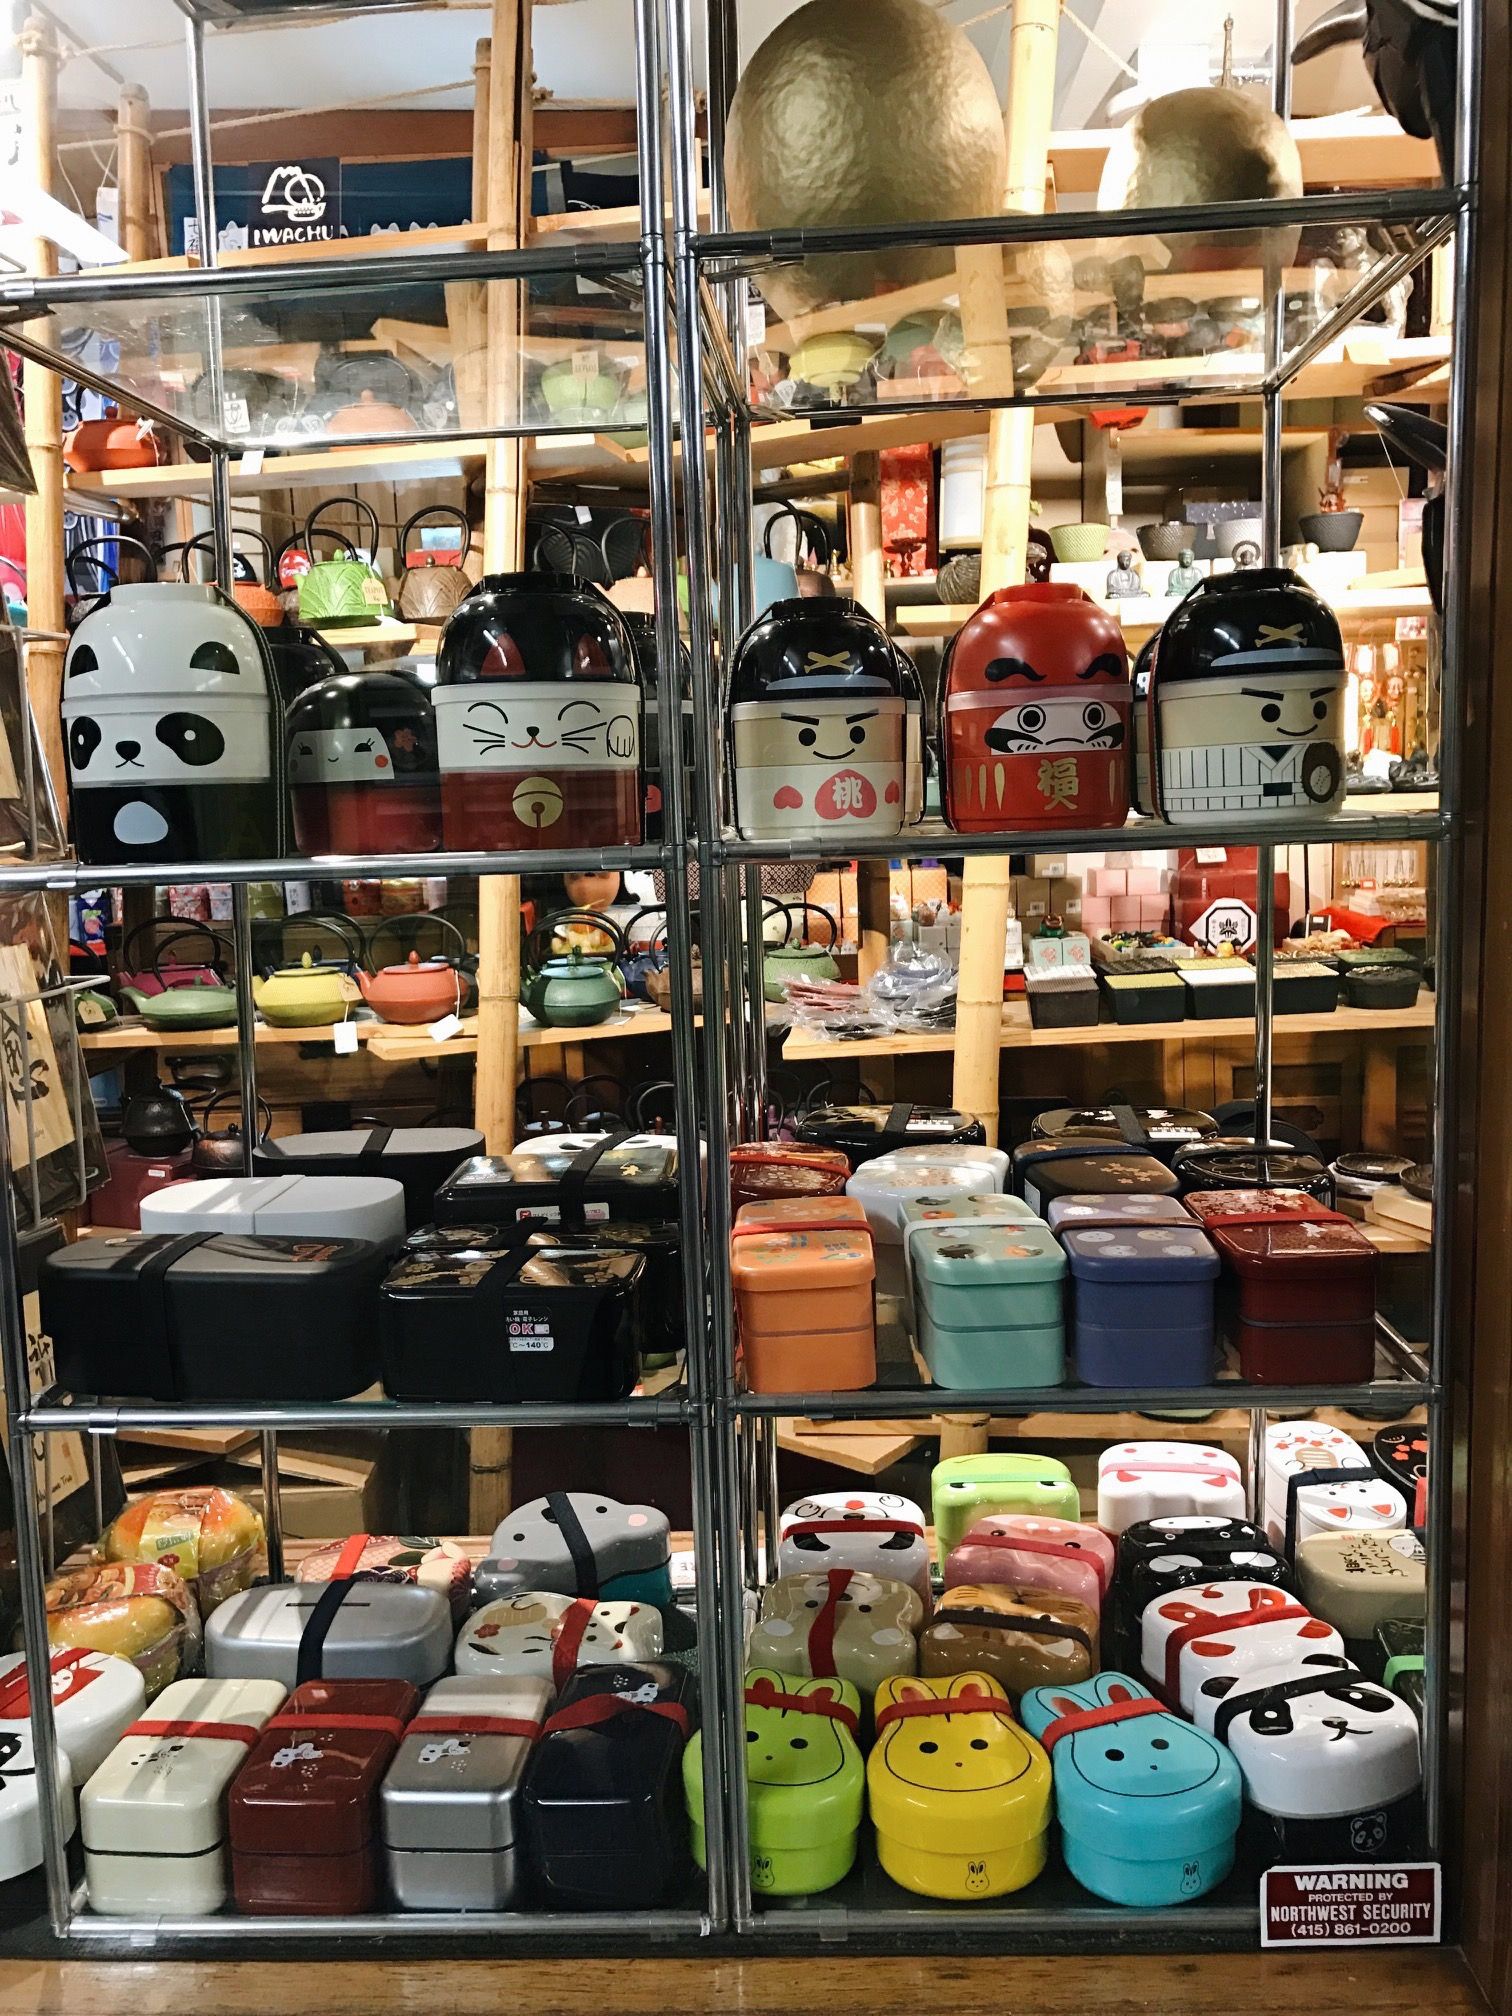 Billions of adorable bento boxes.